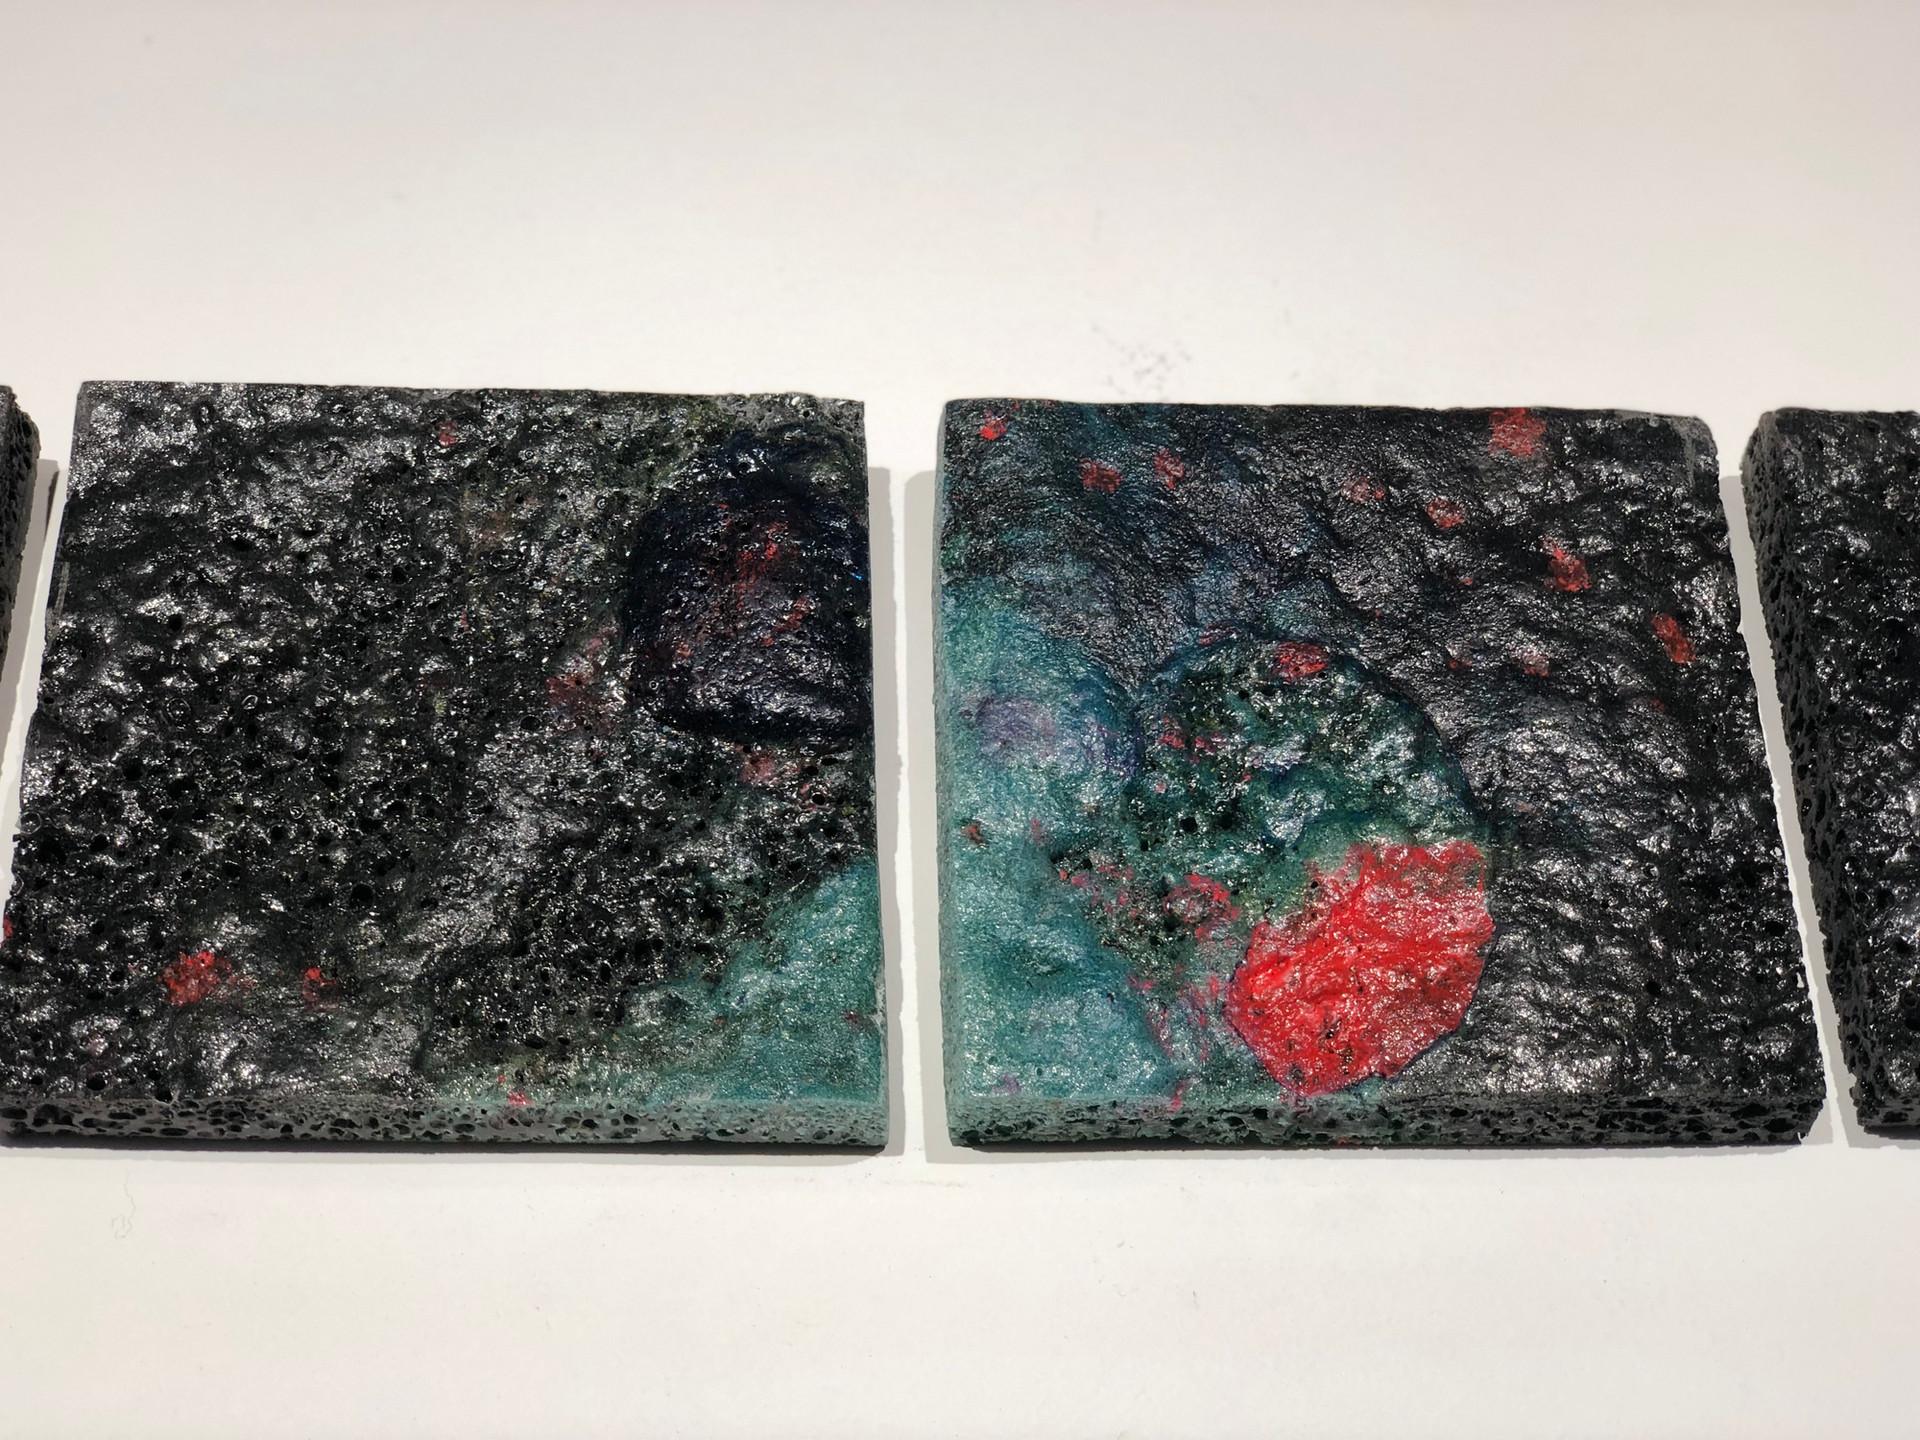 "Seven (Mold) 2019 Series of 4 6"" x 6"" each  Available $100  paraloid B-67, paraloid B-72, casting resin, mineral spirits, epoxy resin, xylene, fiberglass resin,plexiglass dust, polysufide rubber, acrylic medium, acrylic paint, acrylic gesso, baby powder,ink, dye, synthetic amorphous silicone dioxide, polyethylene, wood glue,latex, gesso dust, glass oxide"